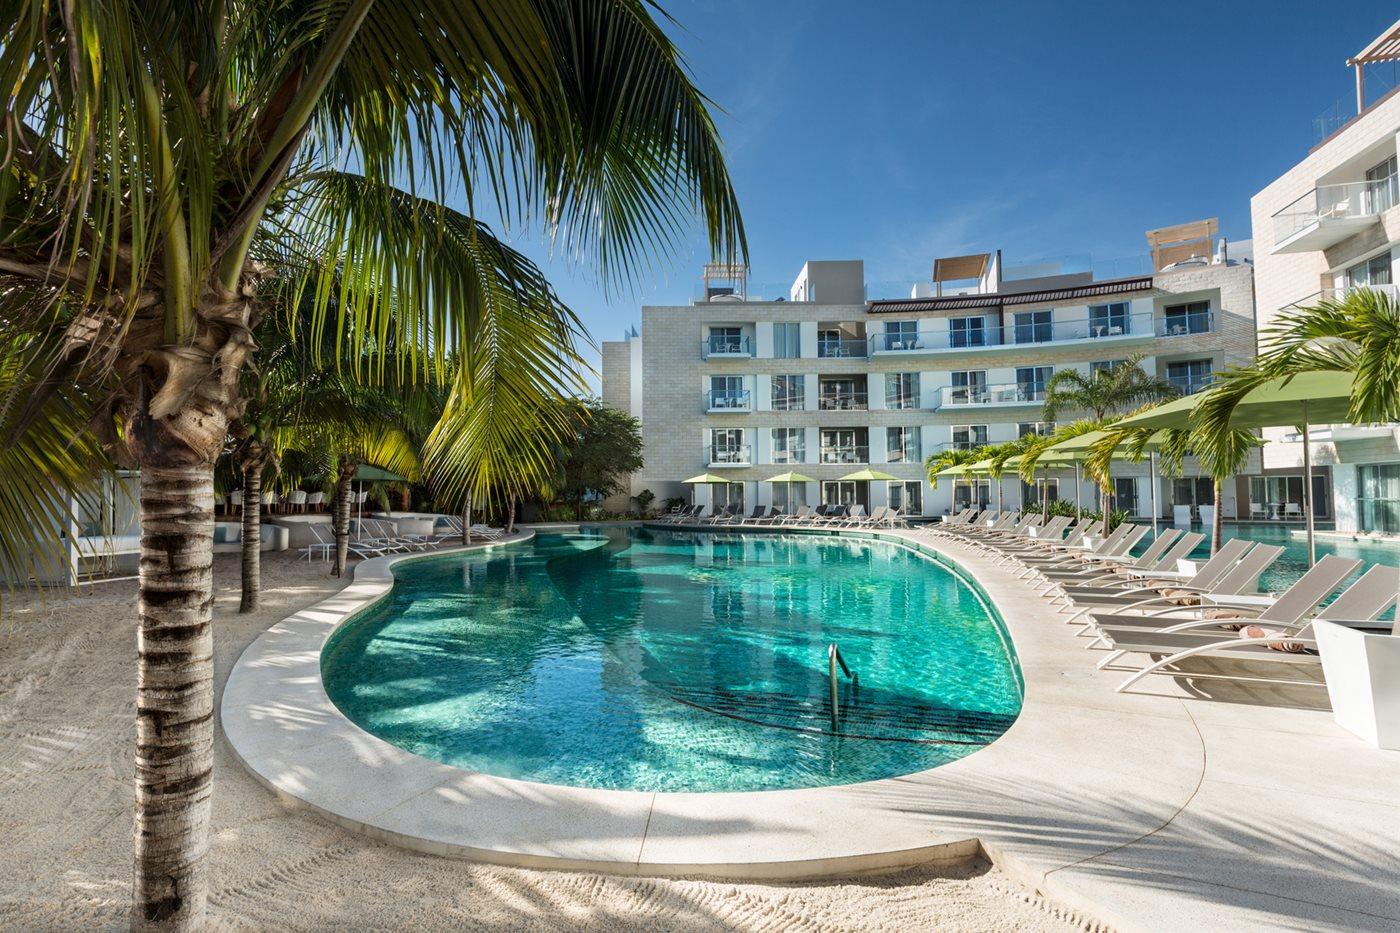 RIV-Fives-Azul-Beach-Hotel-Residence-Del-Carmen-Pool-Adults-002